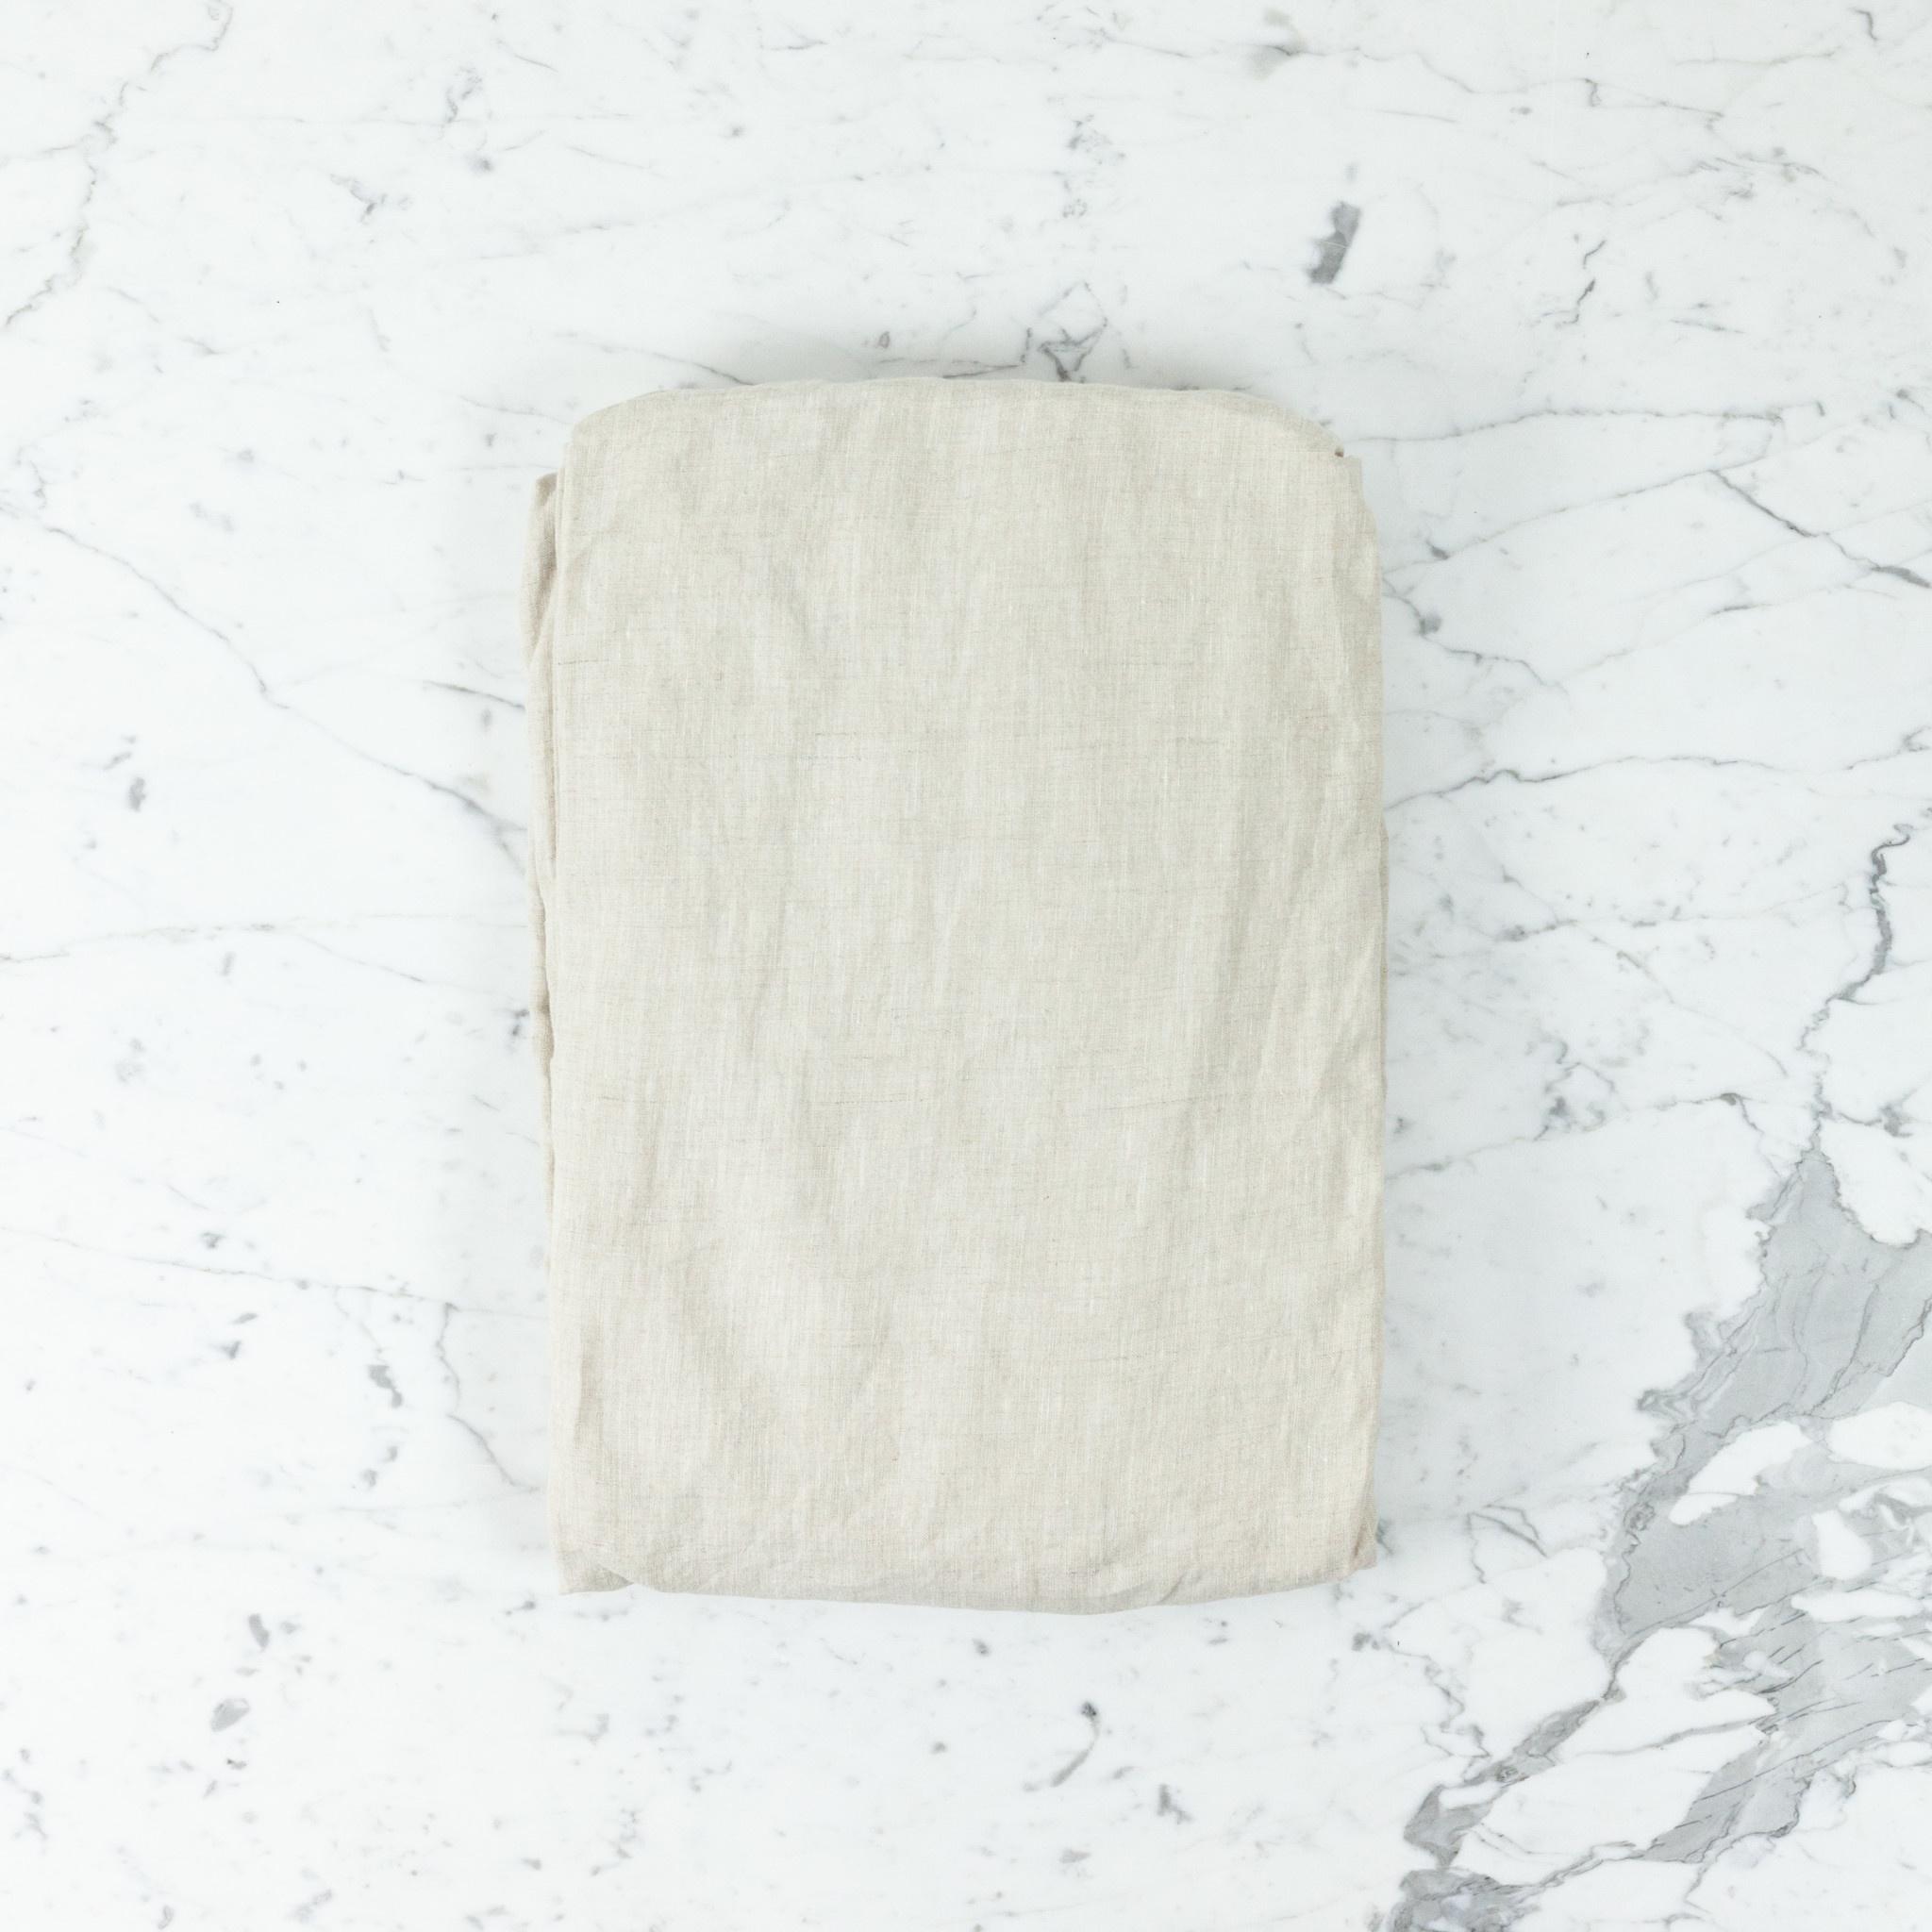 Complete Linen SHEET Set - Queen - Natural - Flat, Fitted, 2 Pillowcases